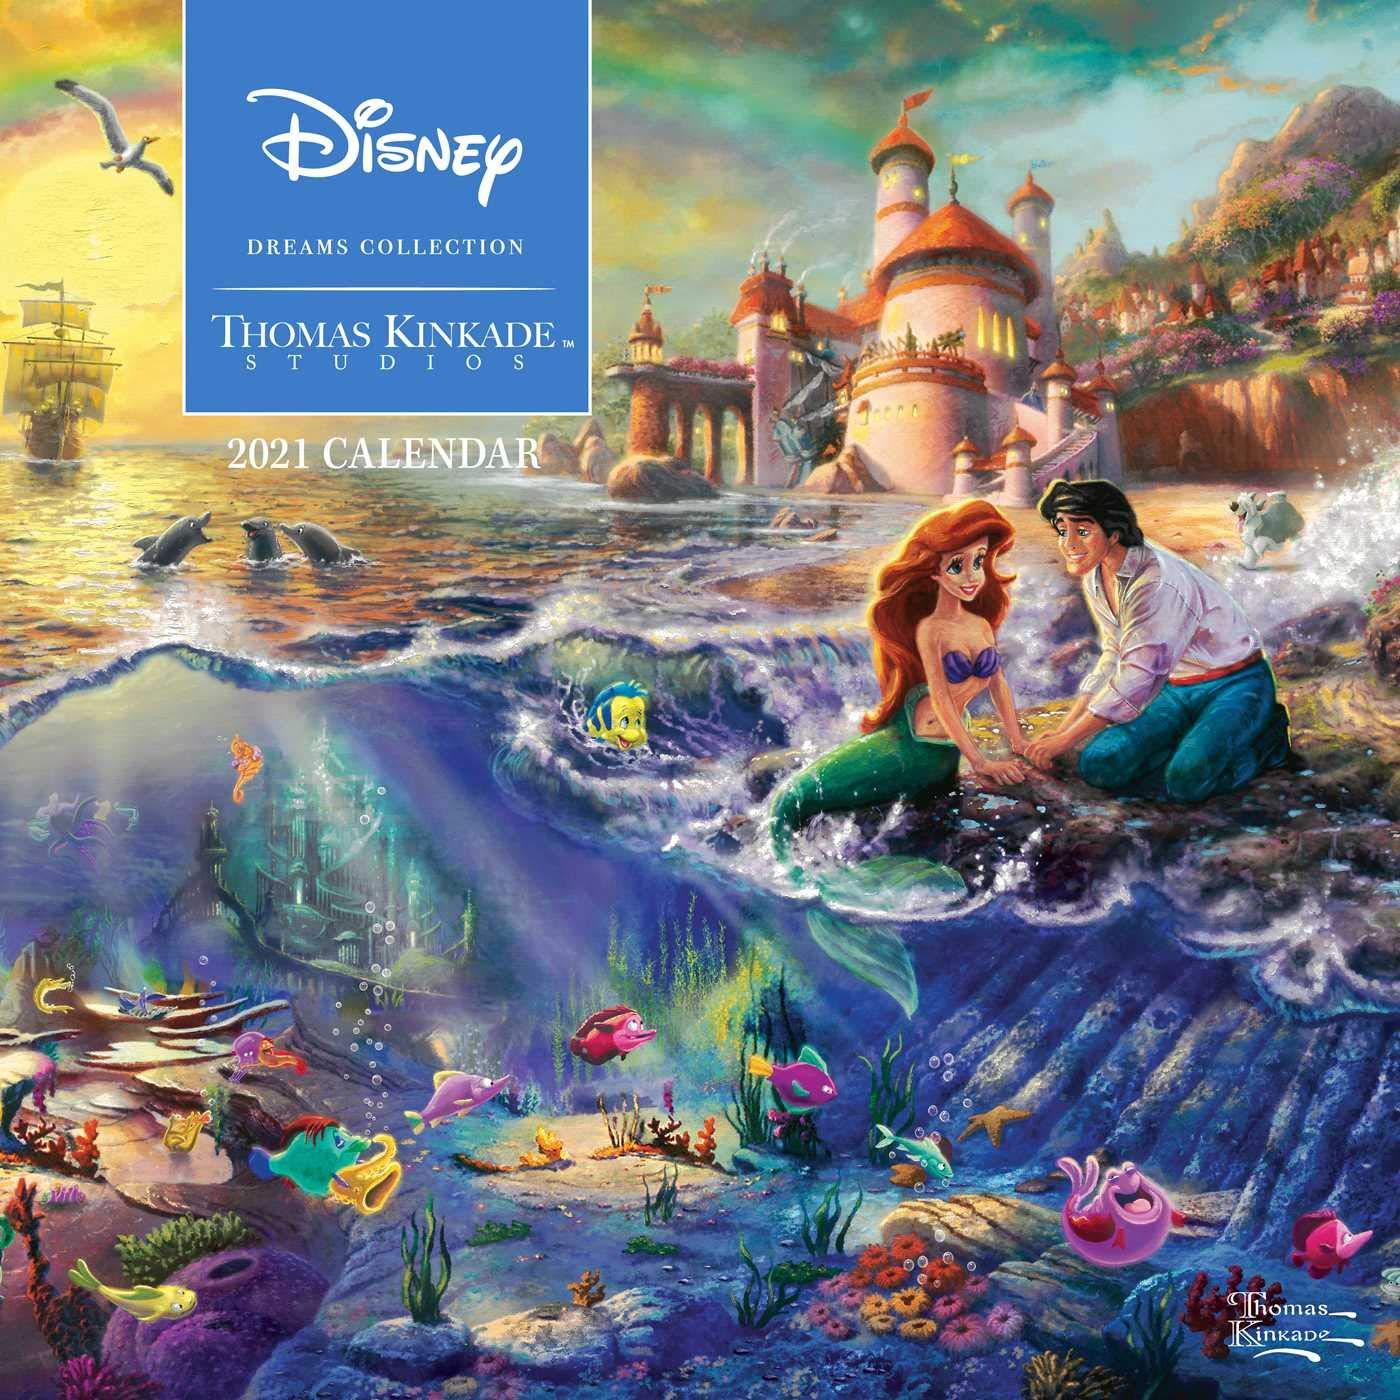 Image for Disney Dreams Collection by Thomas Kinkade Studios: 2021 Wall Calendar